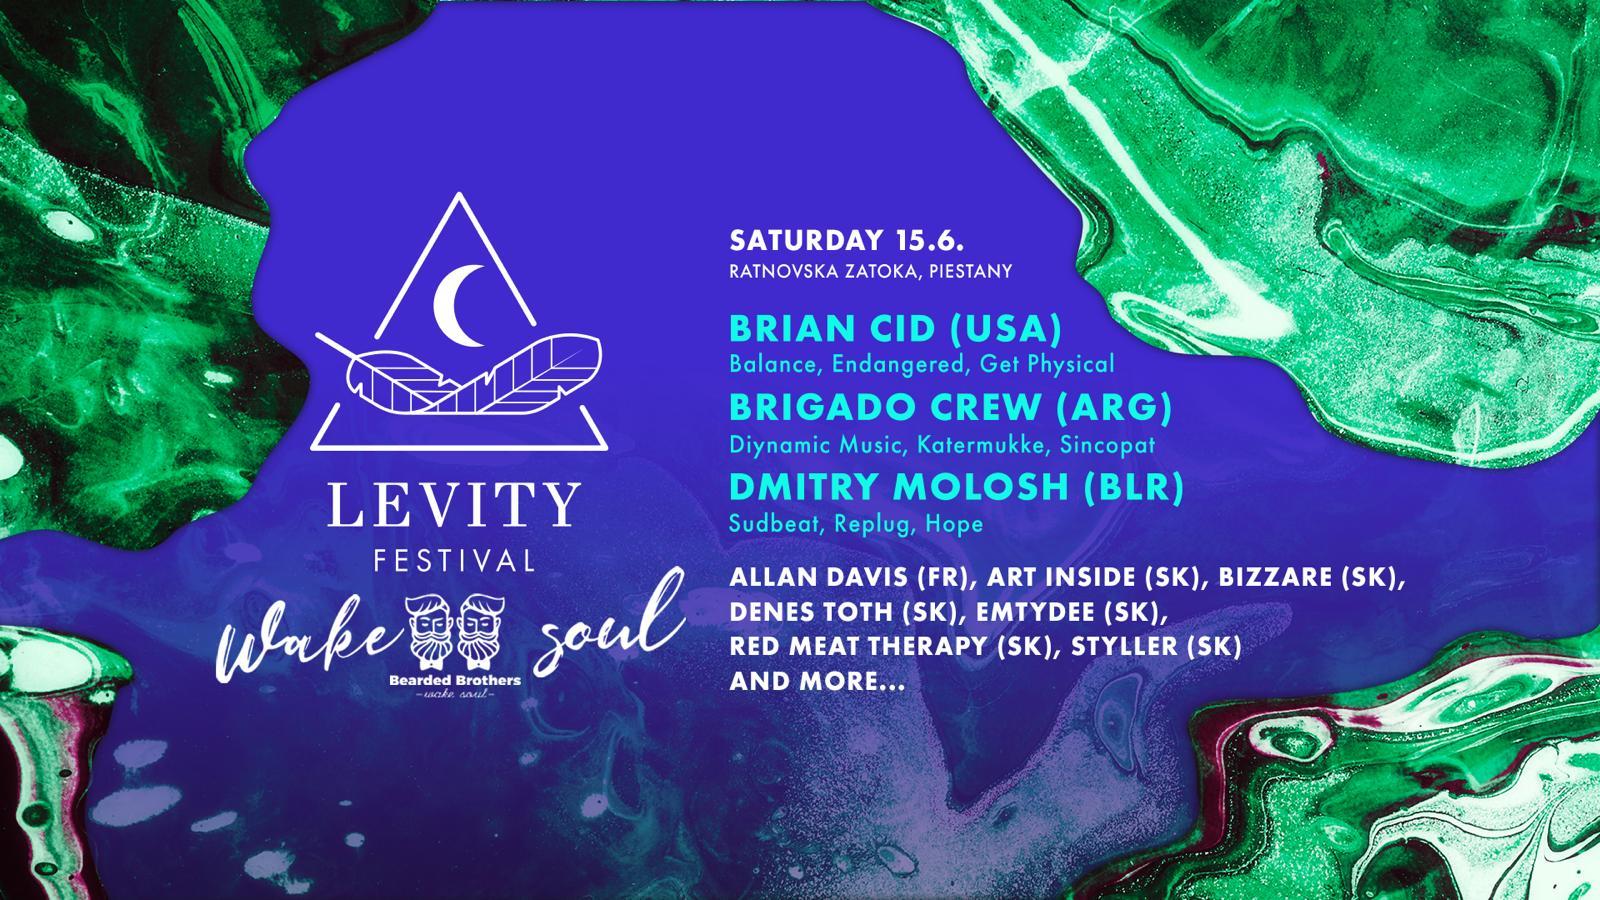 06.15.2019 Levitiy Festival IG.jpg